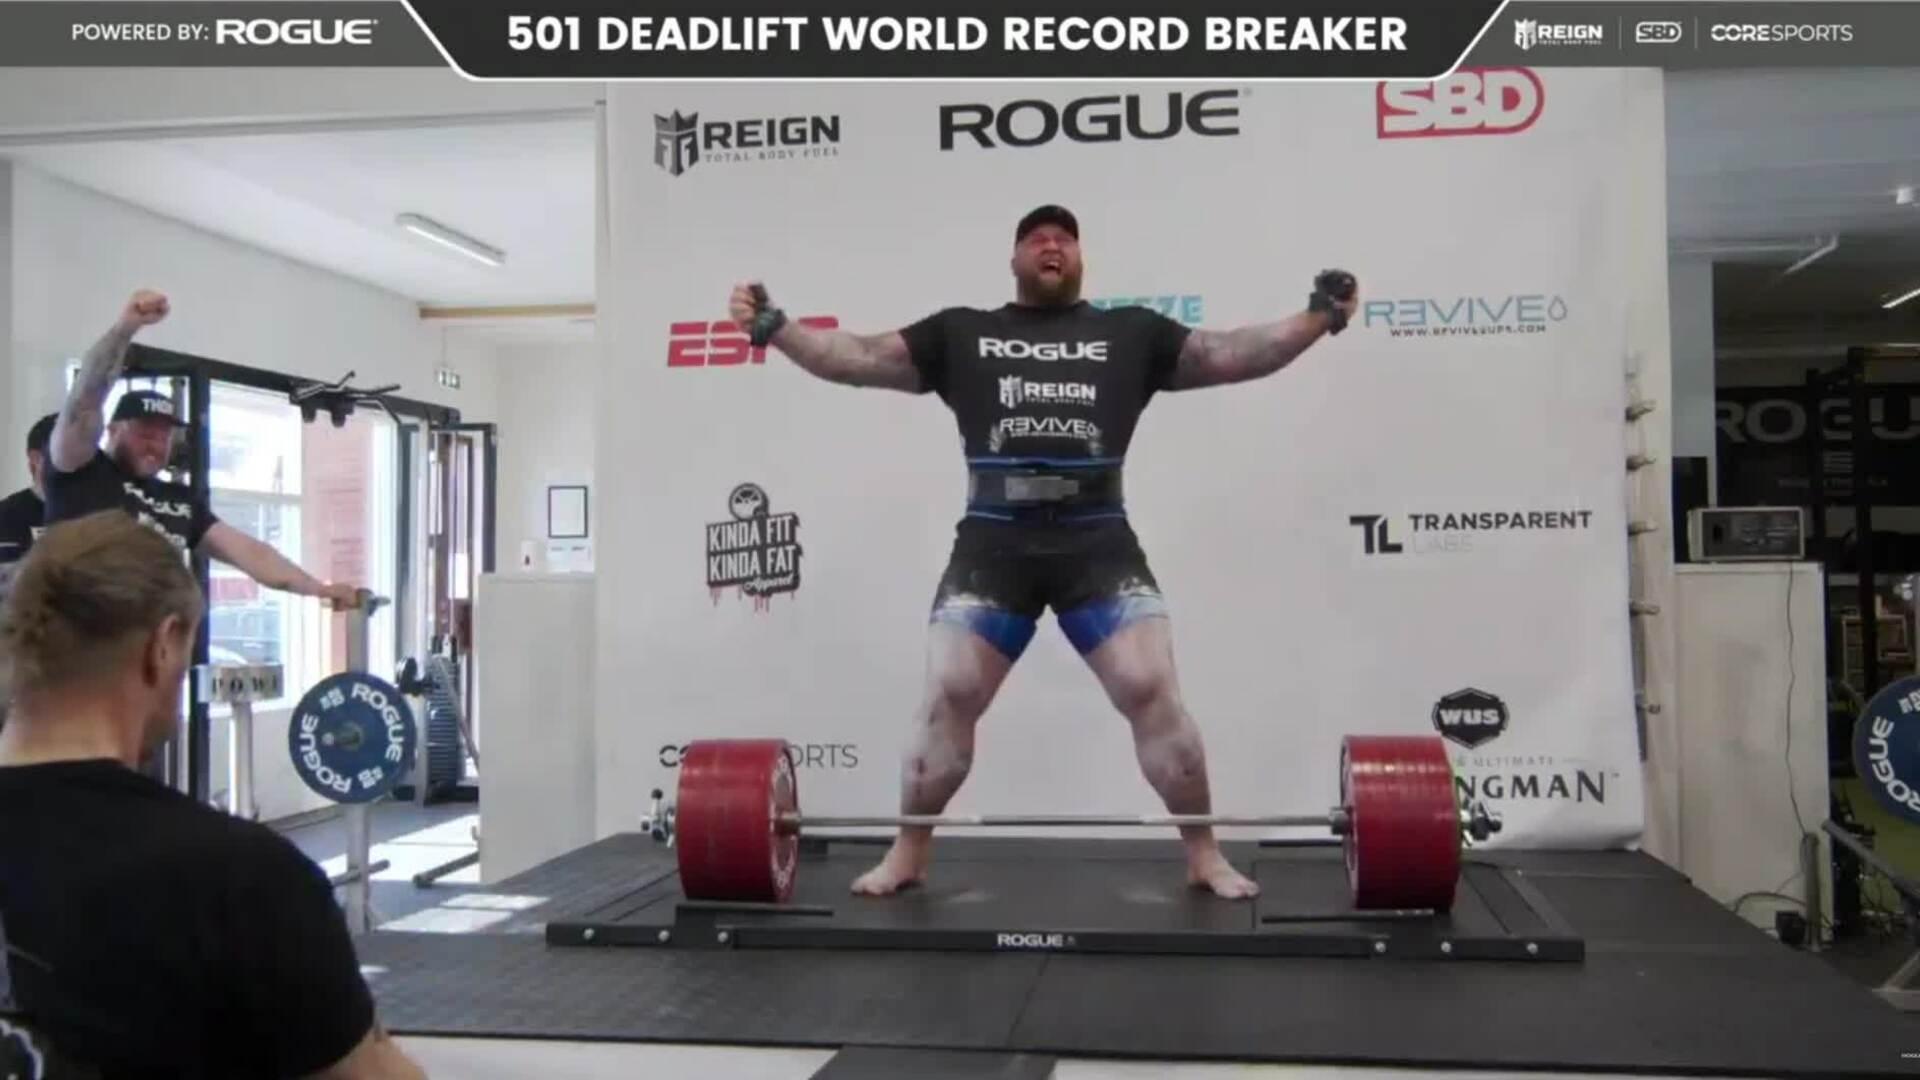 Hafthor Bjornsson Deadlift